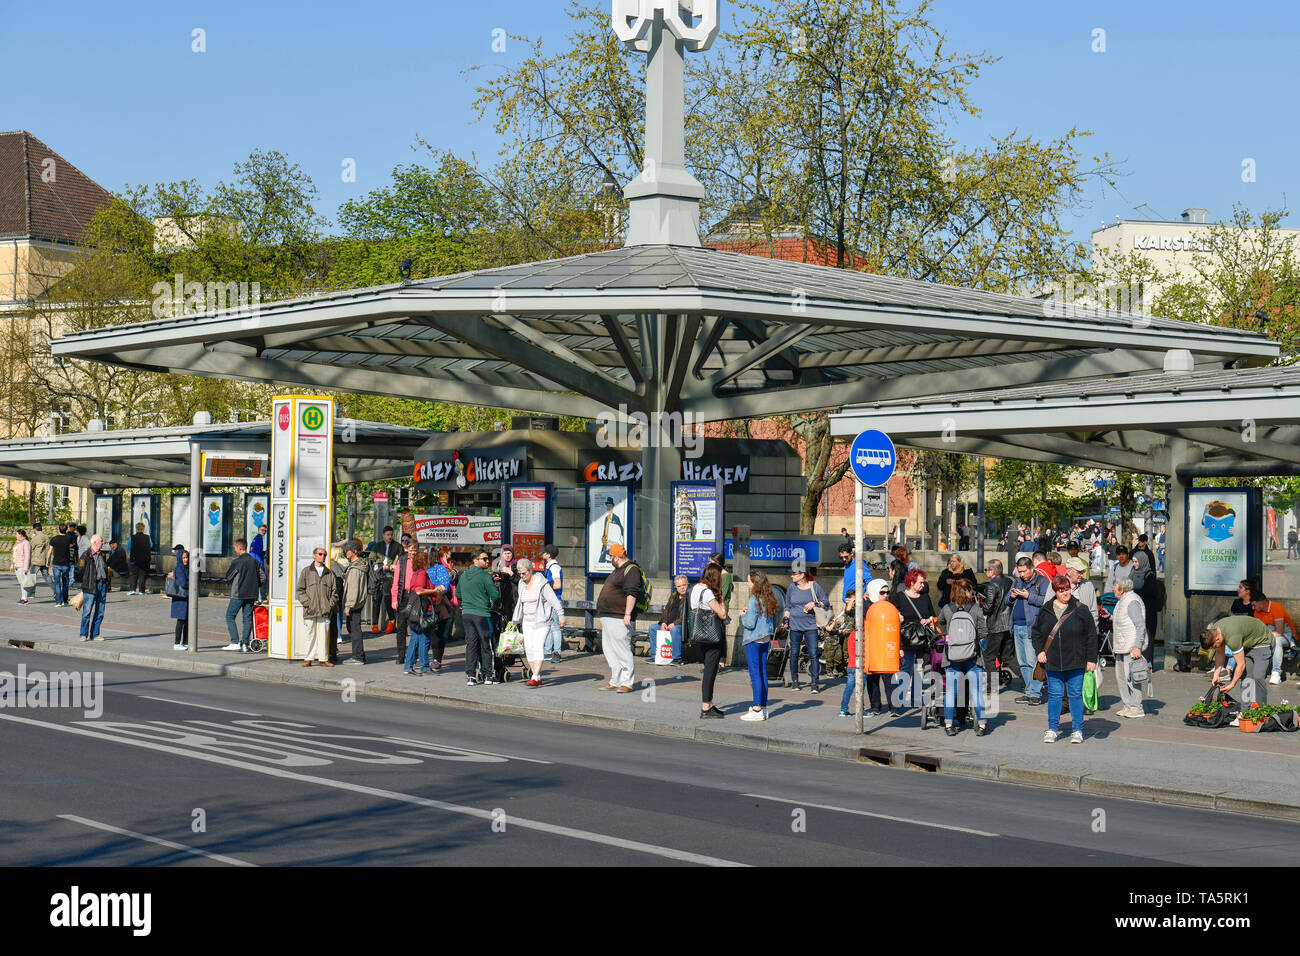 Bus stop, old town-dweller ring, Spandau, Berlin, Germany, Bushaltestelle, Altstädter Ring, Deutschland Stock Photo